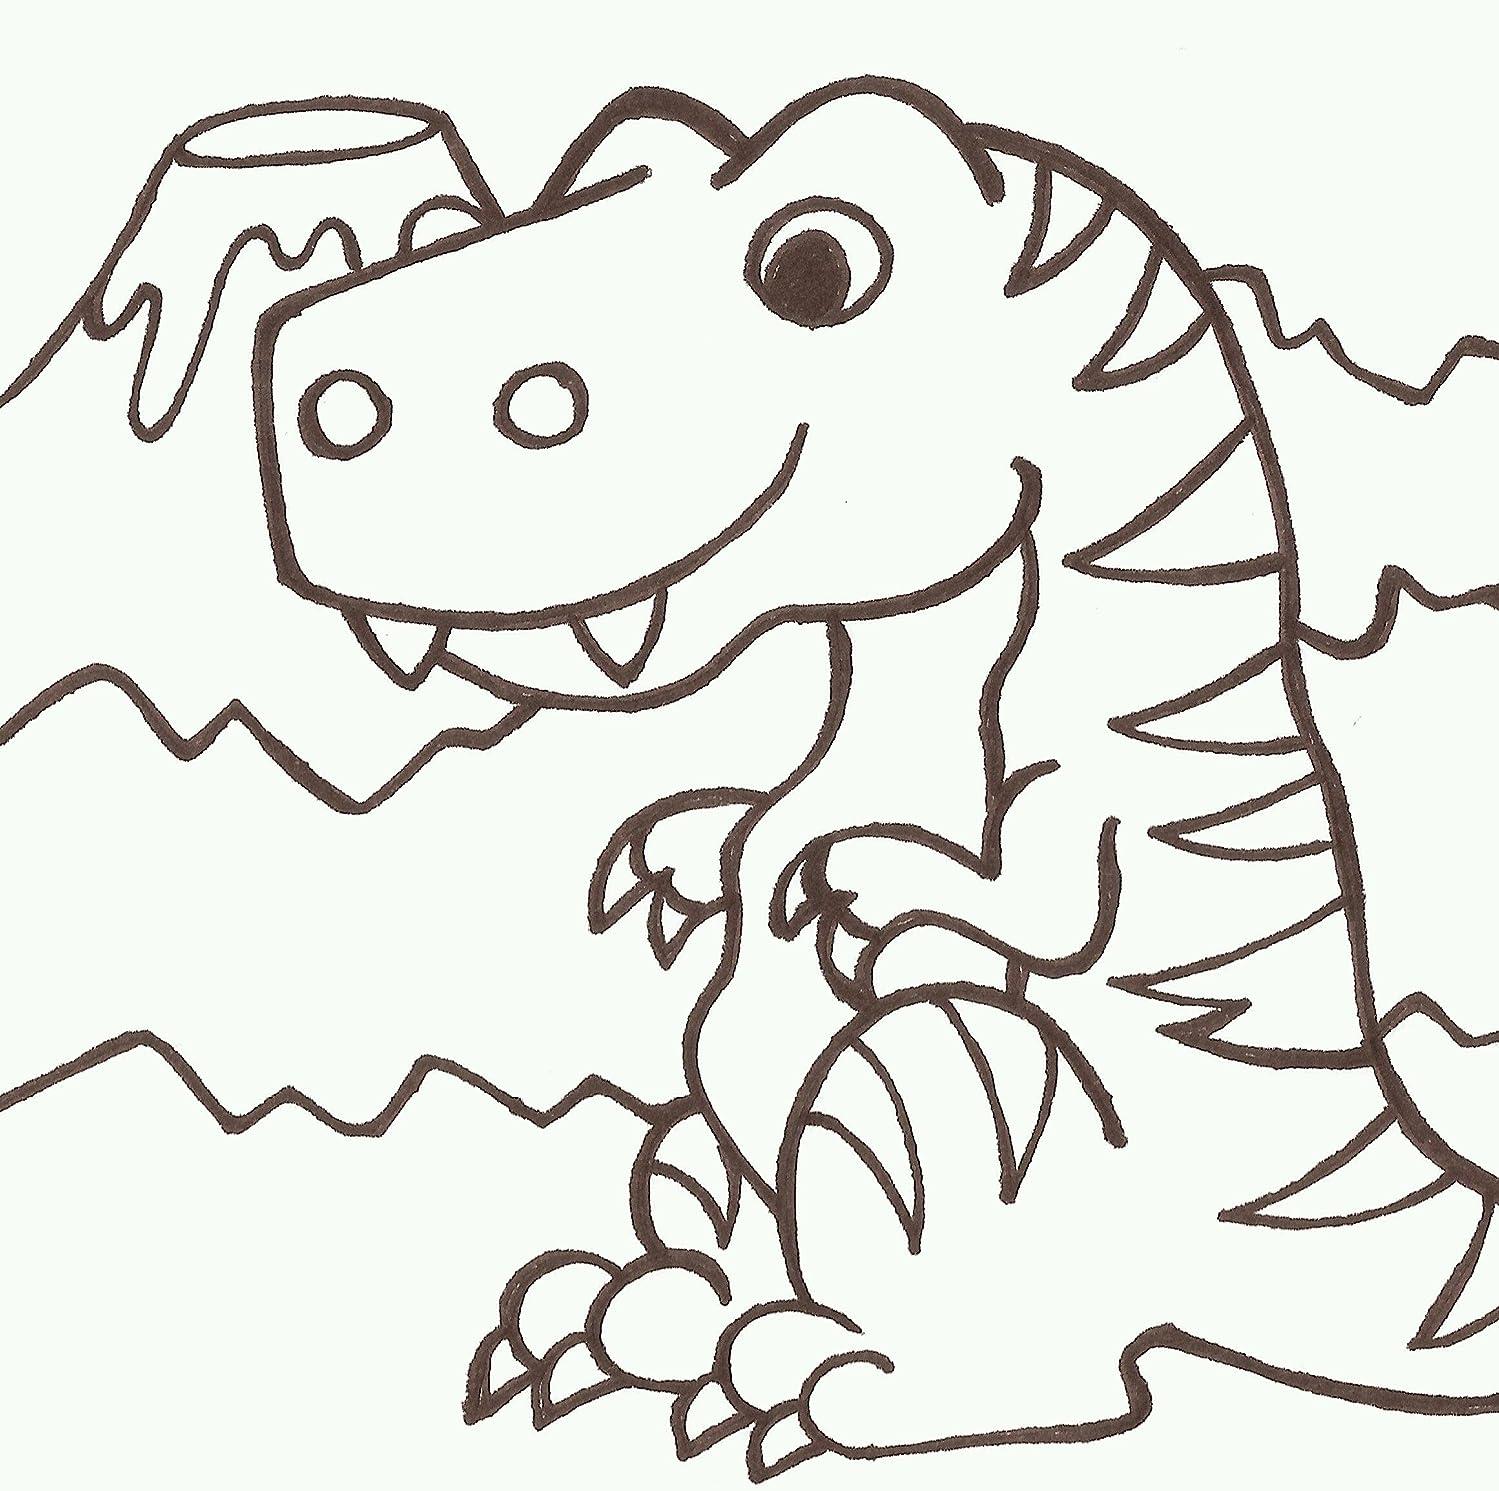 PaintaDoodle 12 x 12 T-Rex Painting Kit